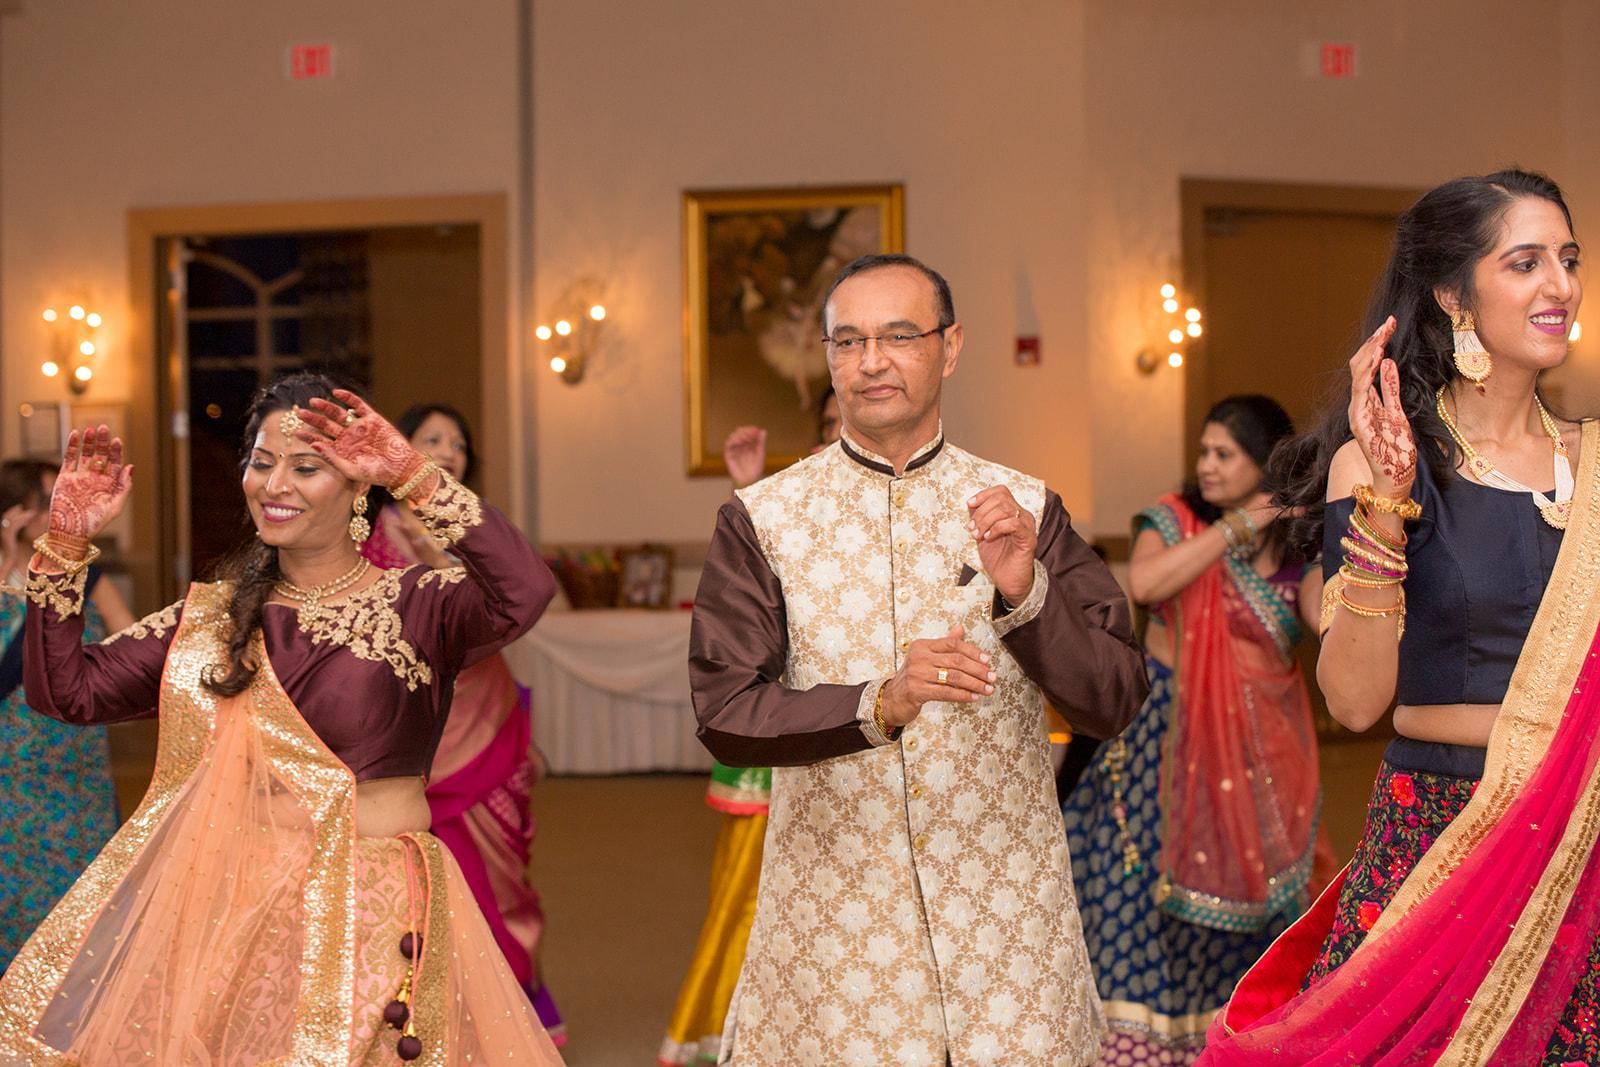 Le Cape Weddings - Puja and Kheelan - Garba A   -196.jpg